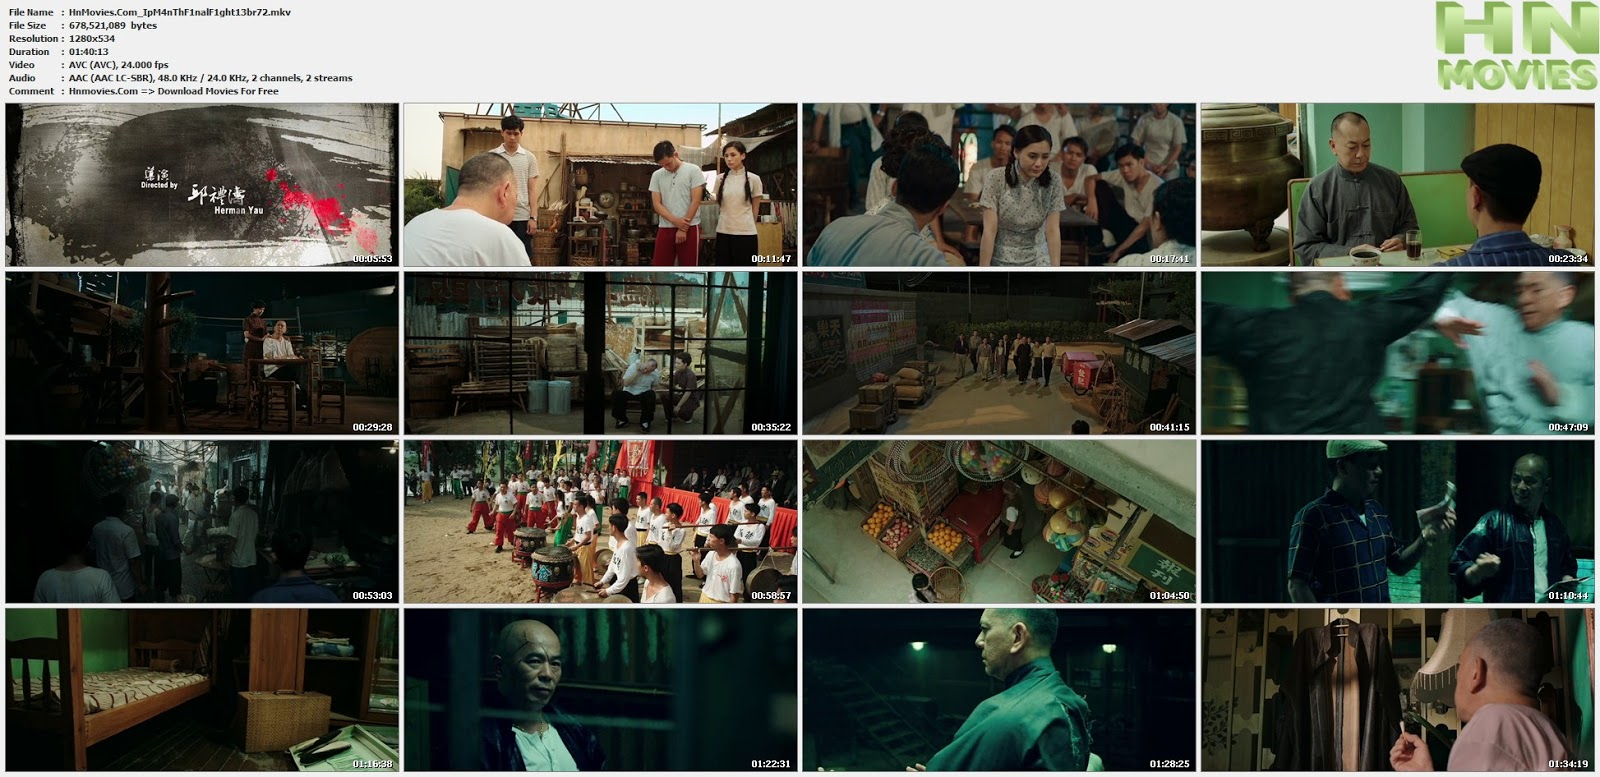 movie screenshot of Ip Man: The Final Fight fdmovie.com